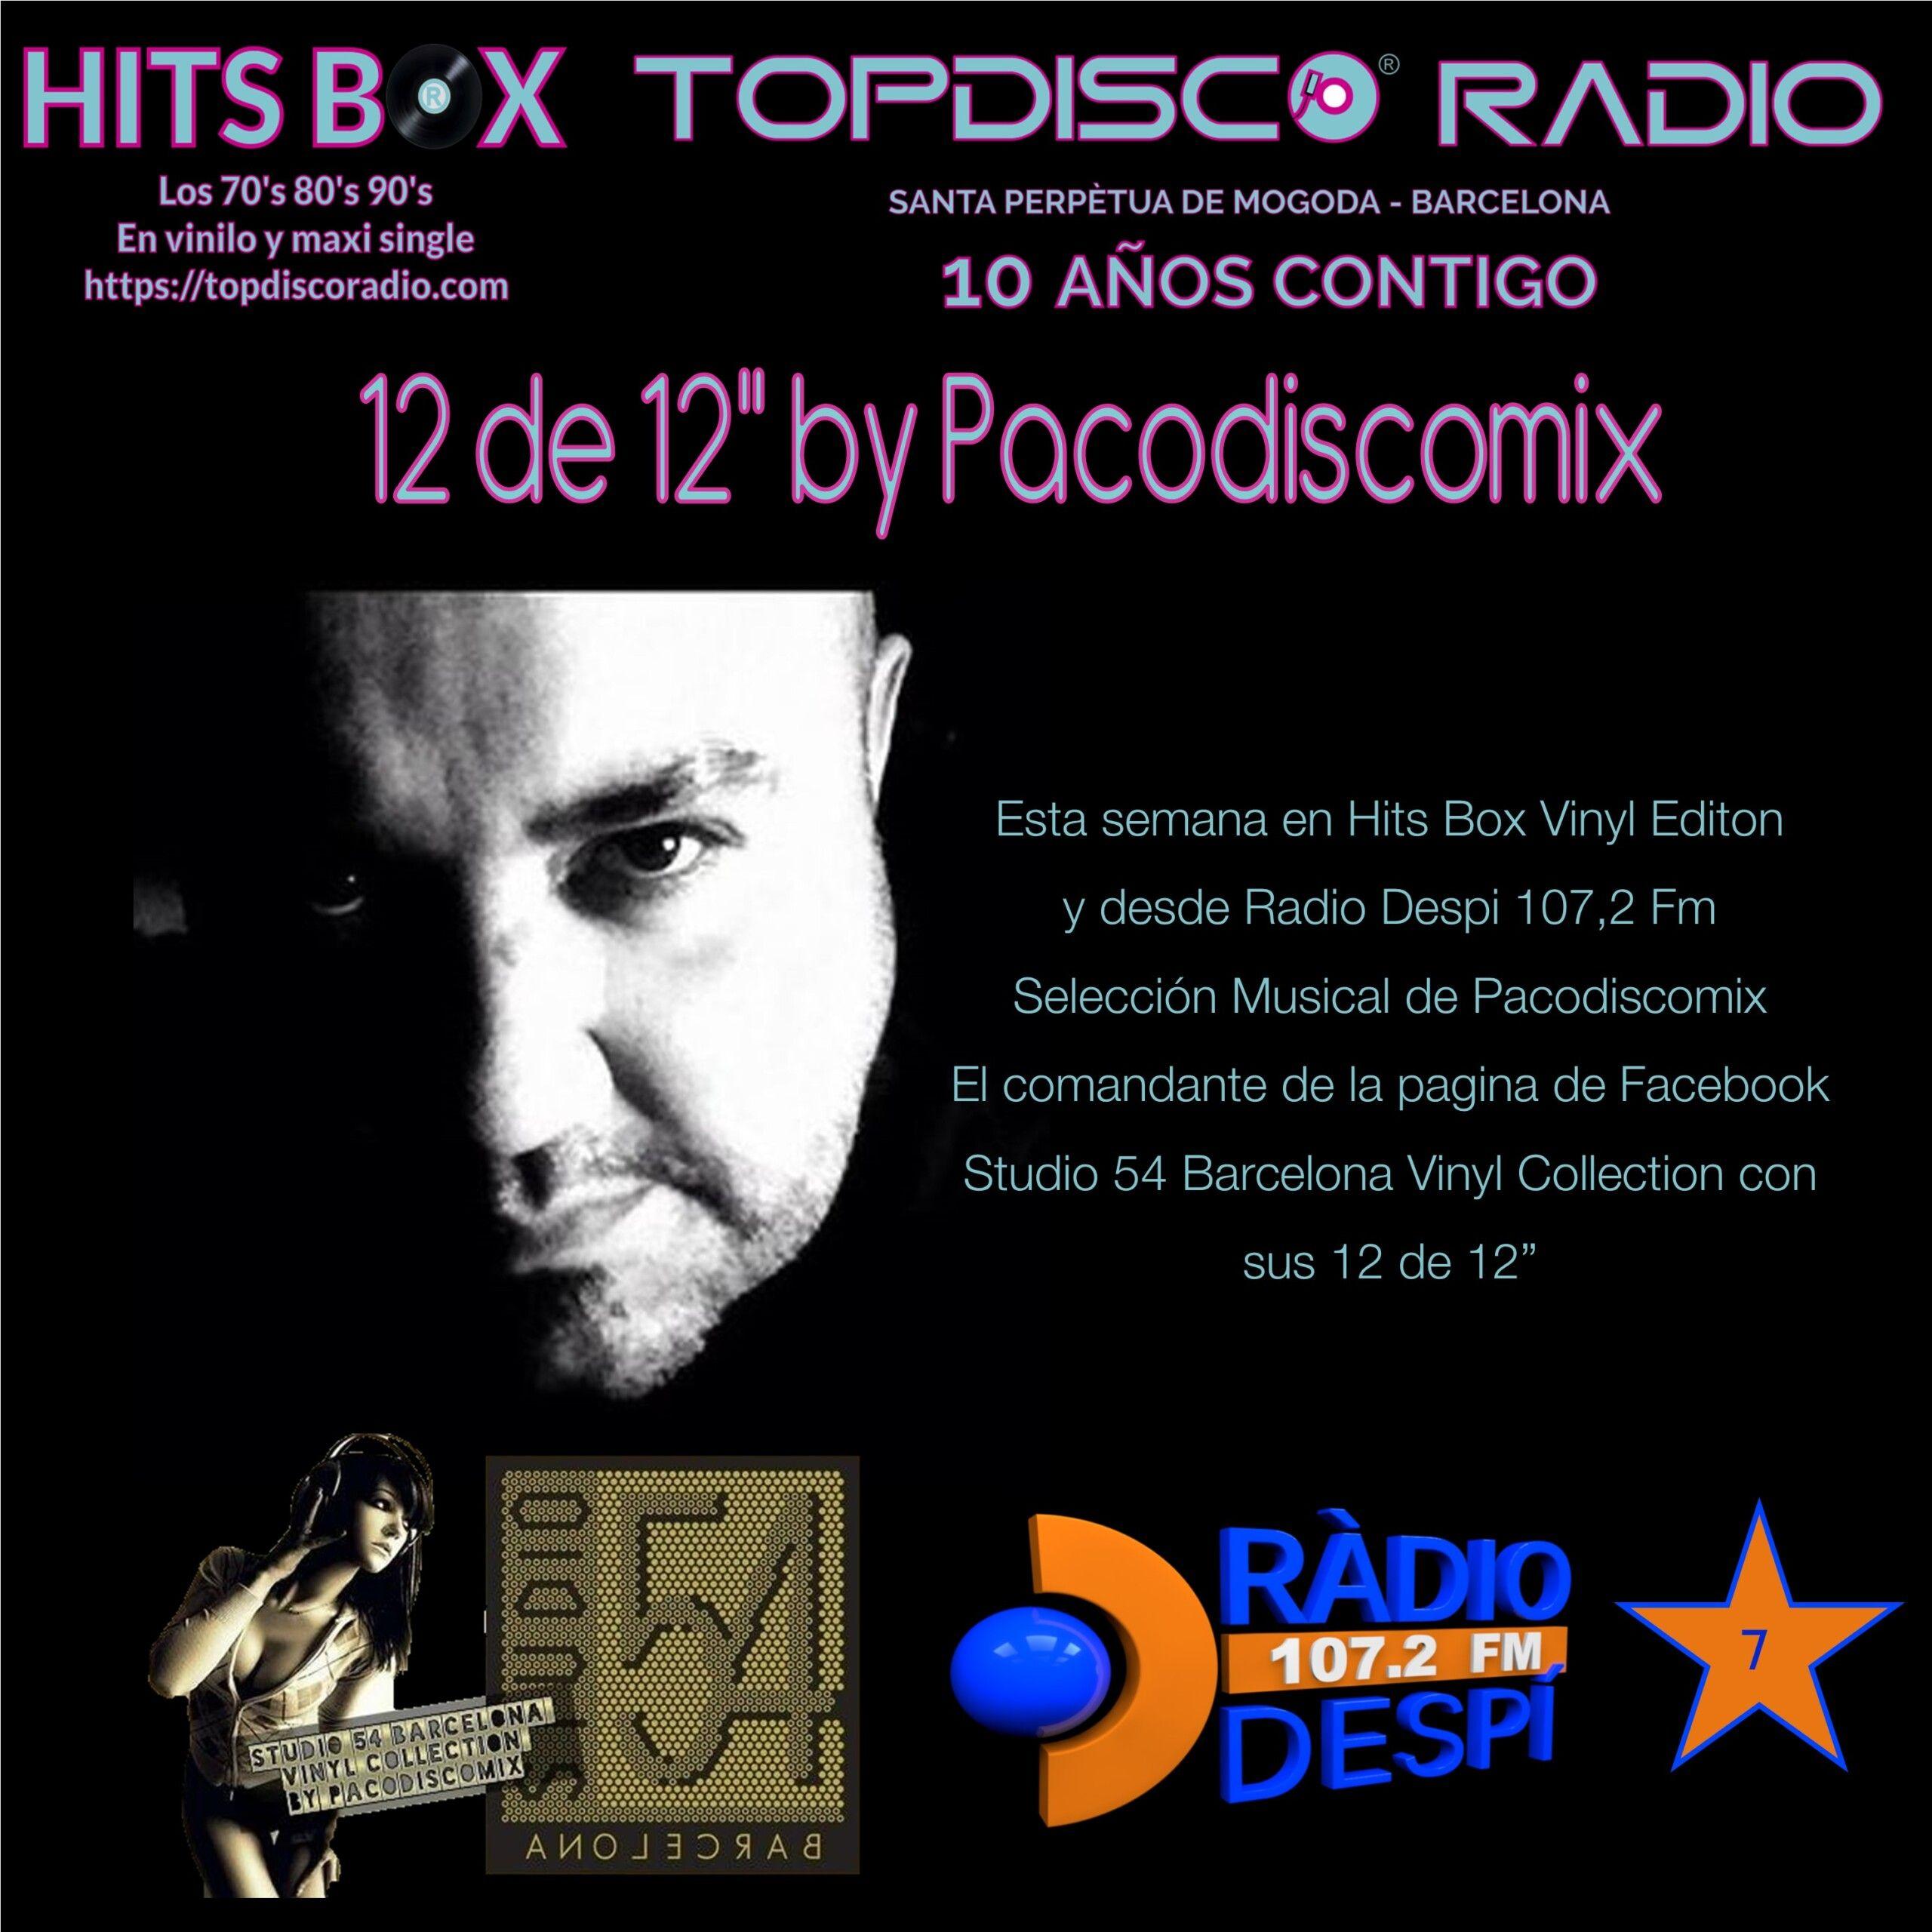 12 de 12 Pacodiscomix - Studio 54 Barcelona - Topdisco Radio - Hits Box - Radio Despi